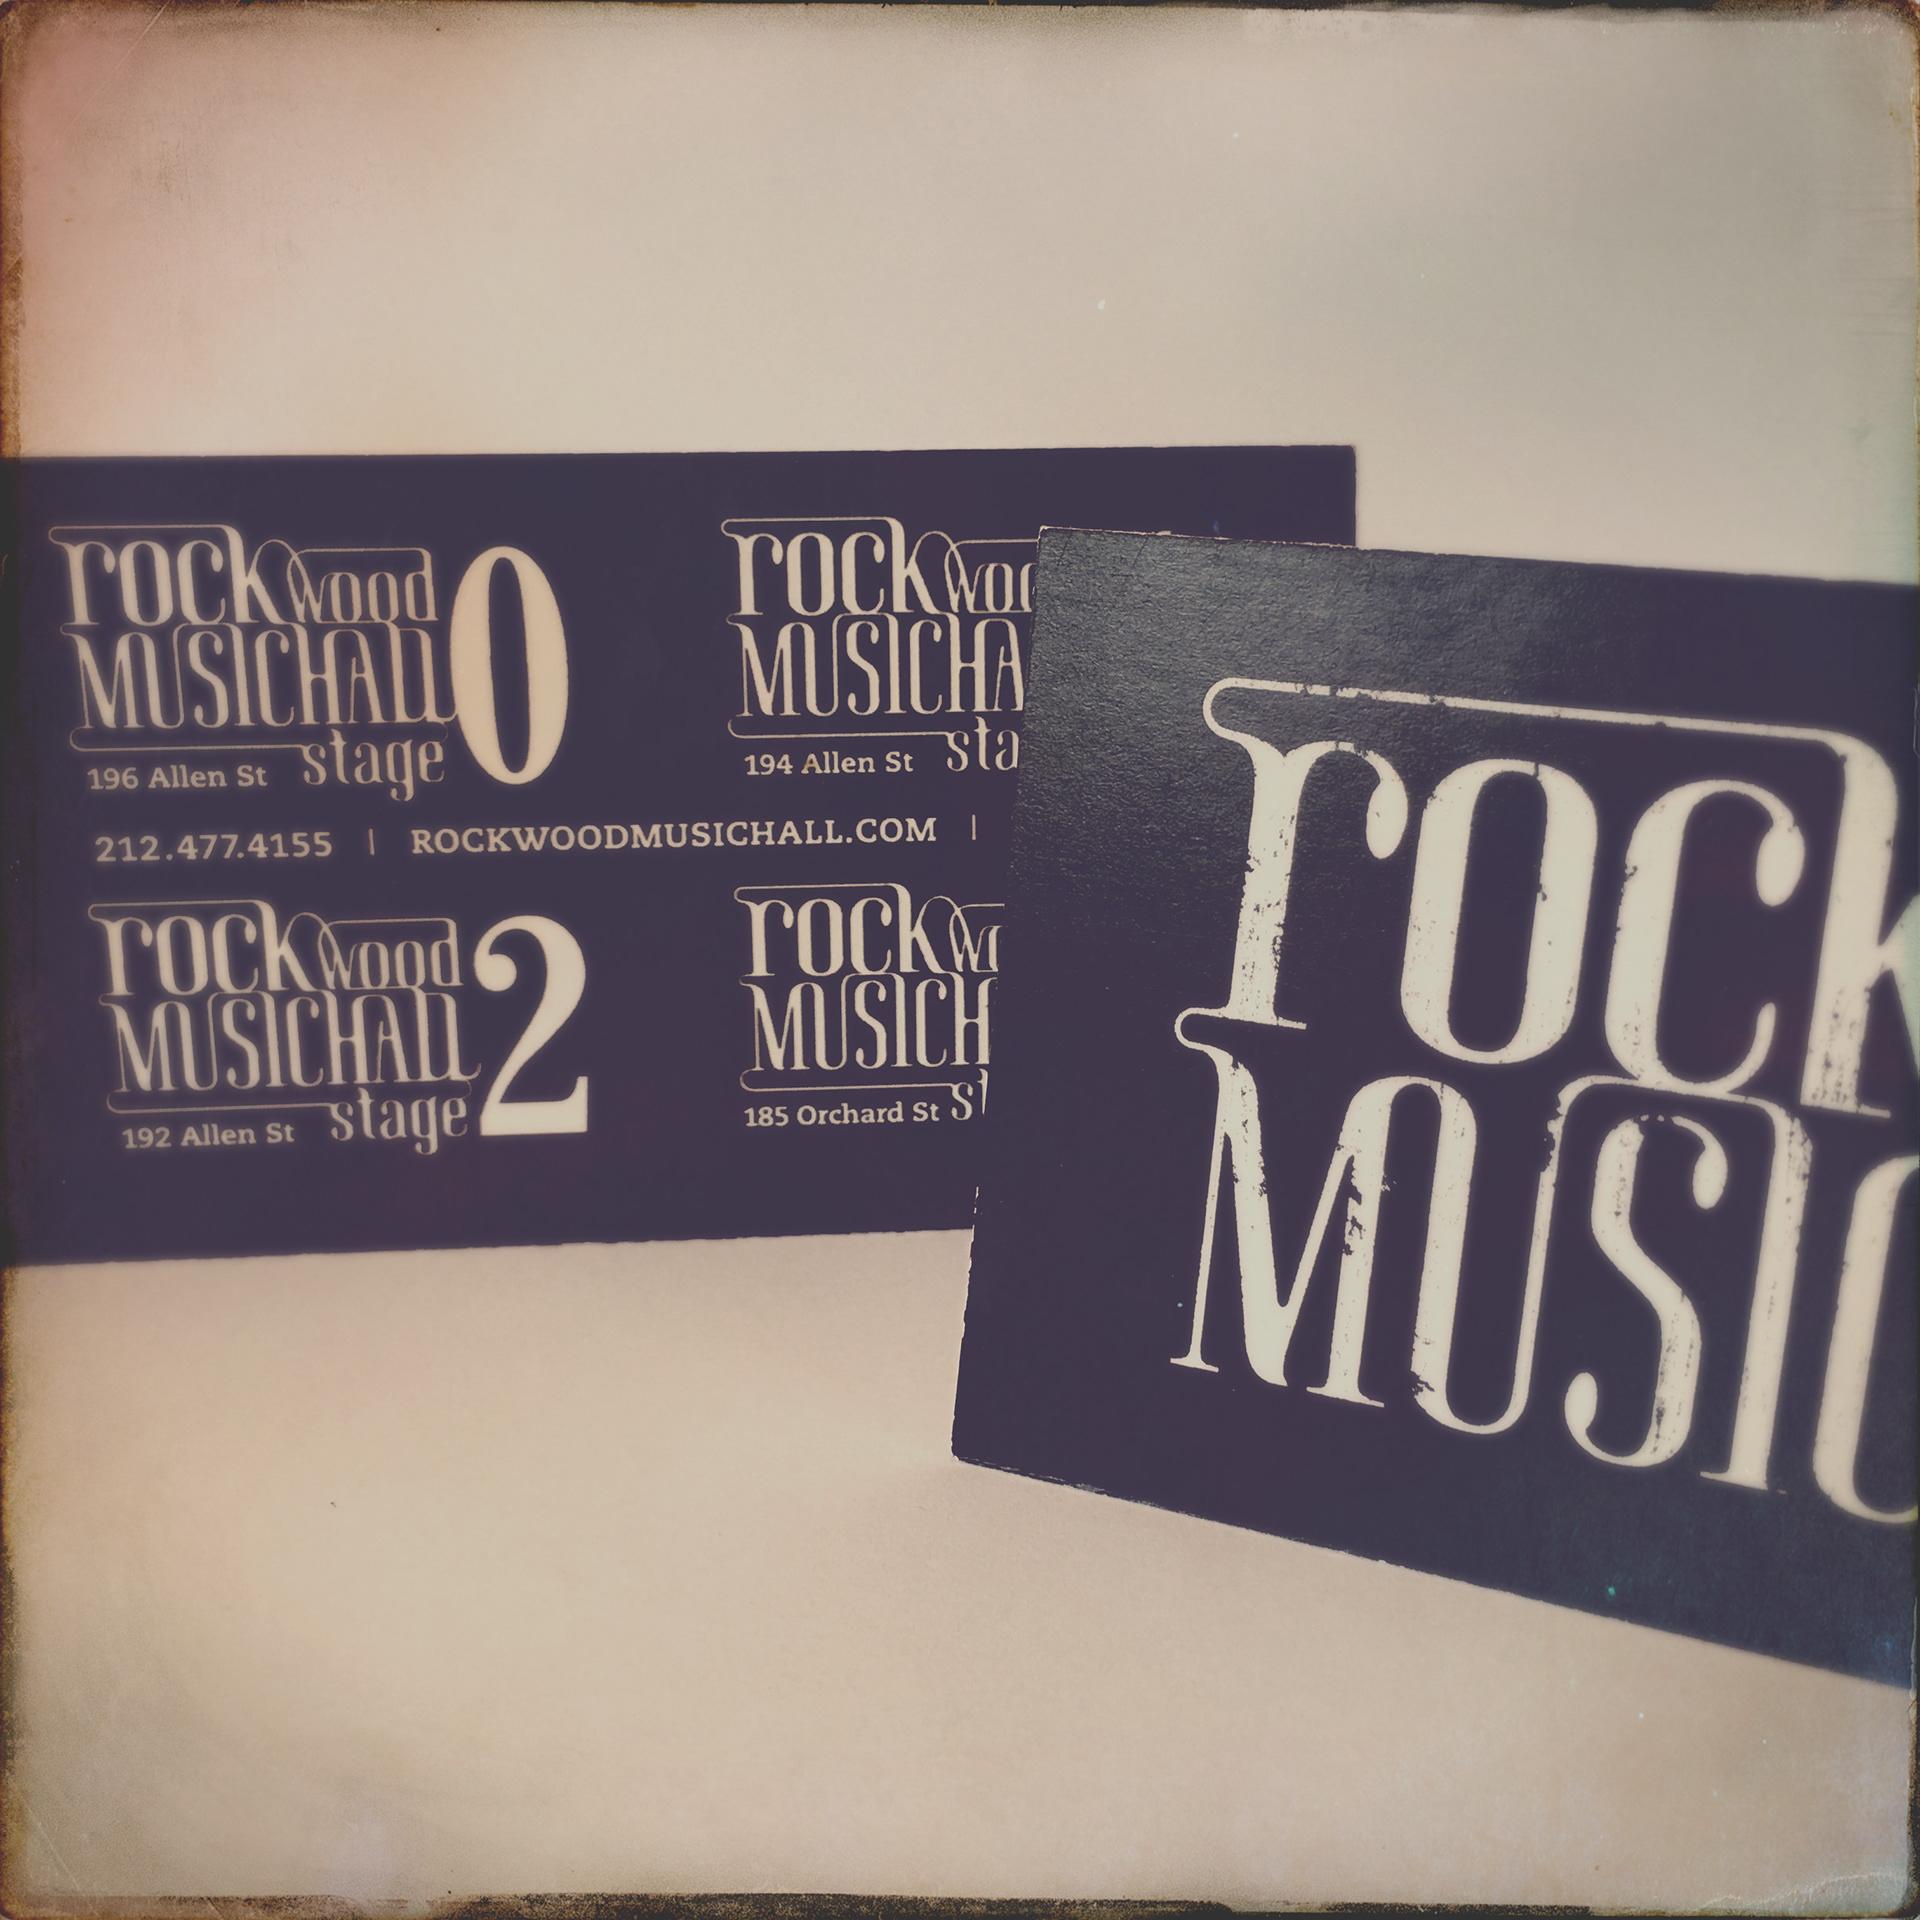 Silo Design Inc - Rockwood Musichall: Multi-capacity business card